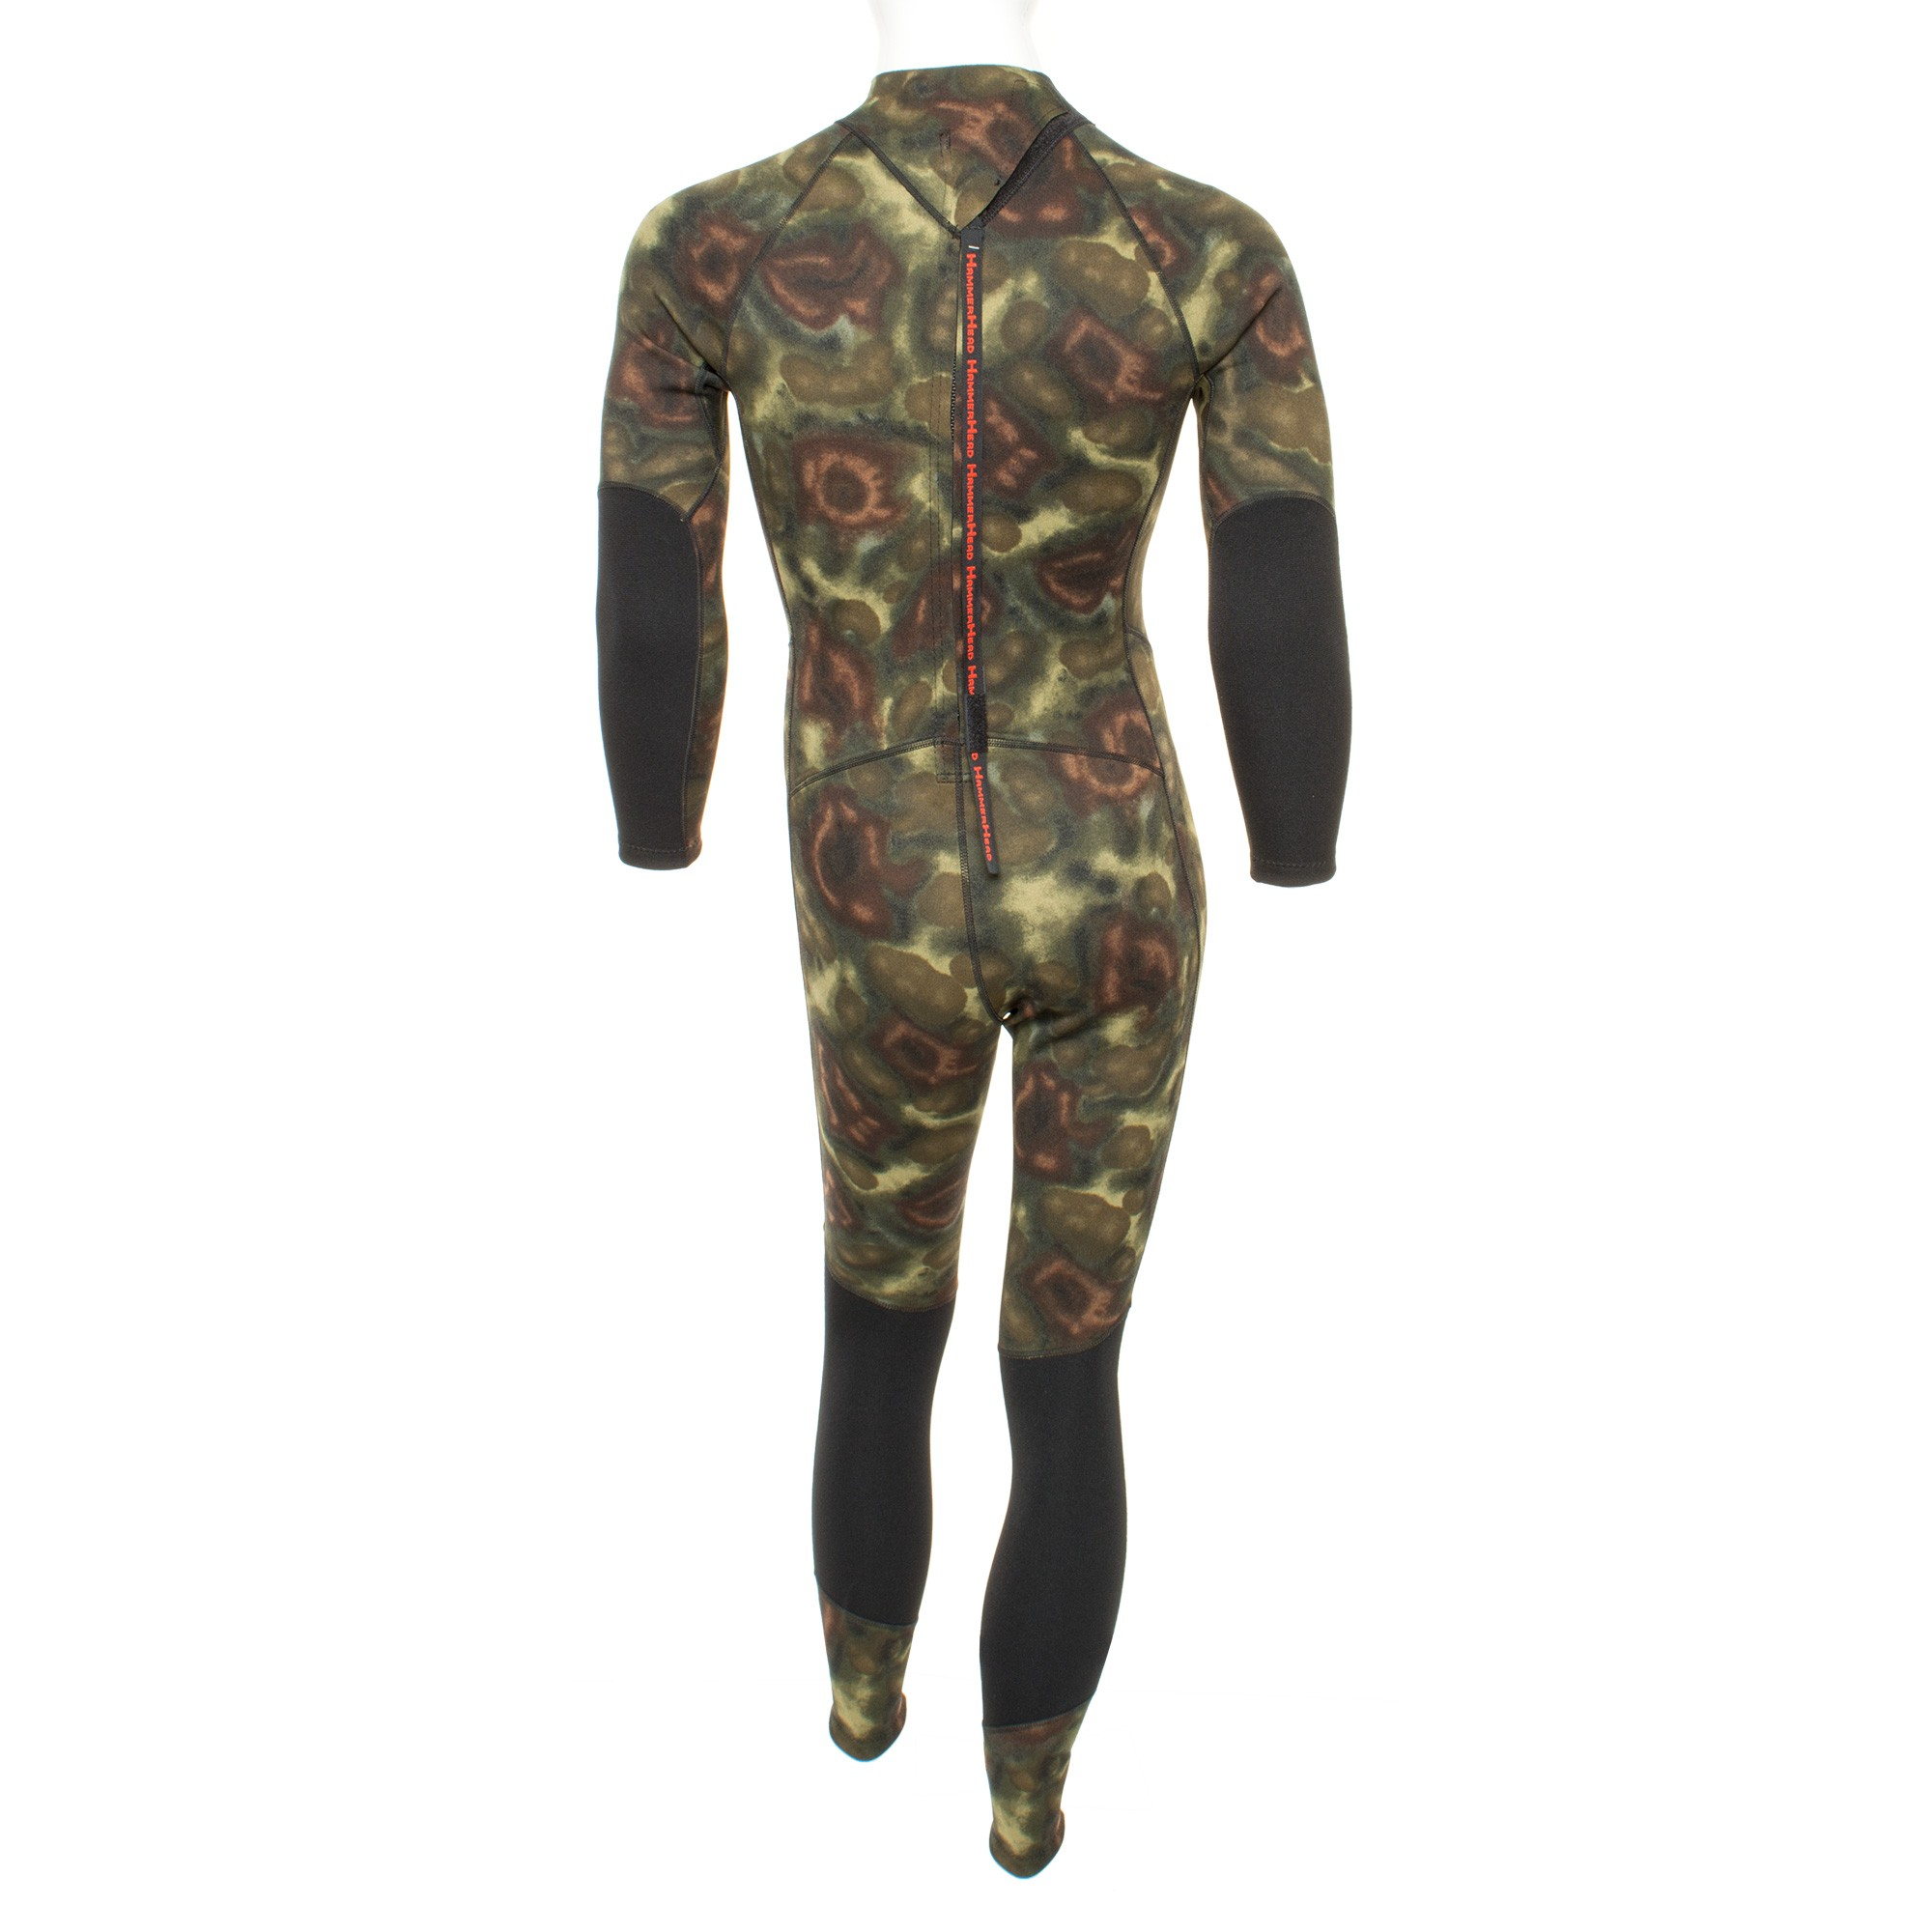 Hammerhead Ambush Wetsuit, 2 mm One-Piece Back